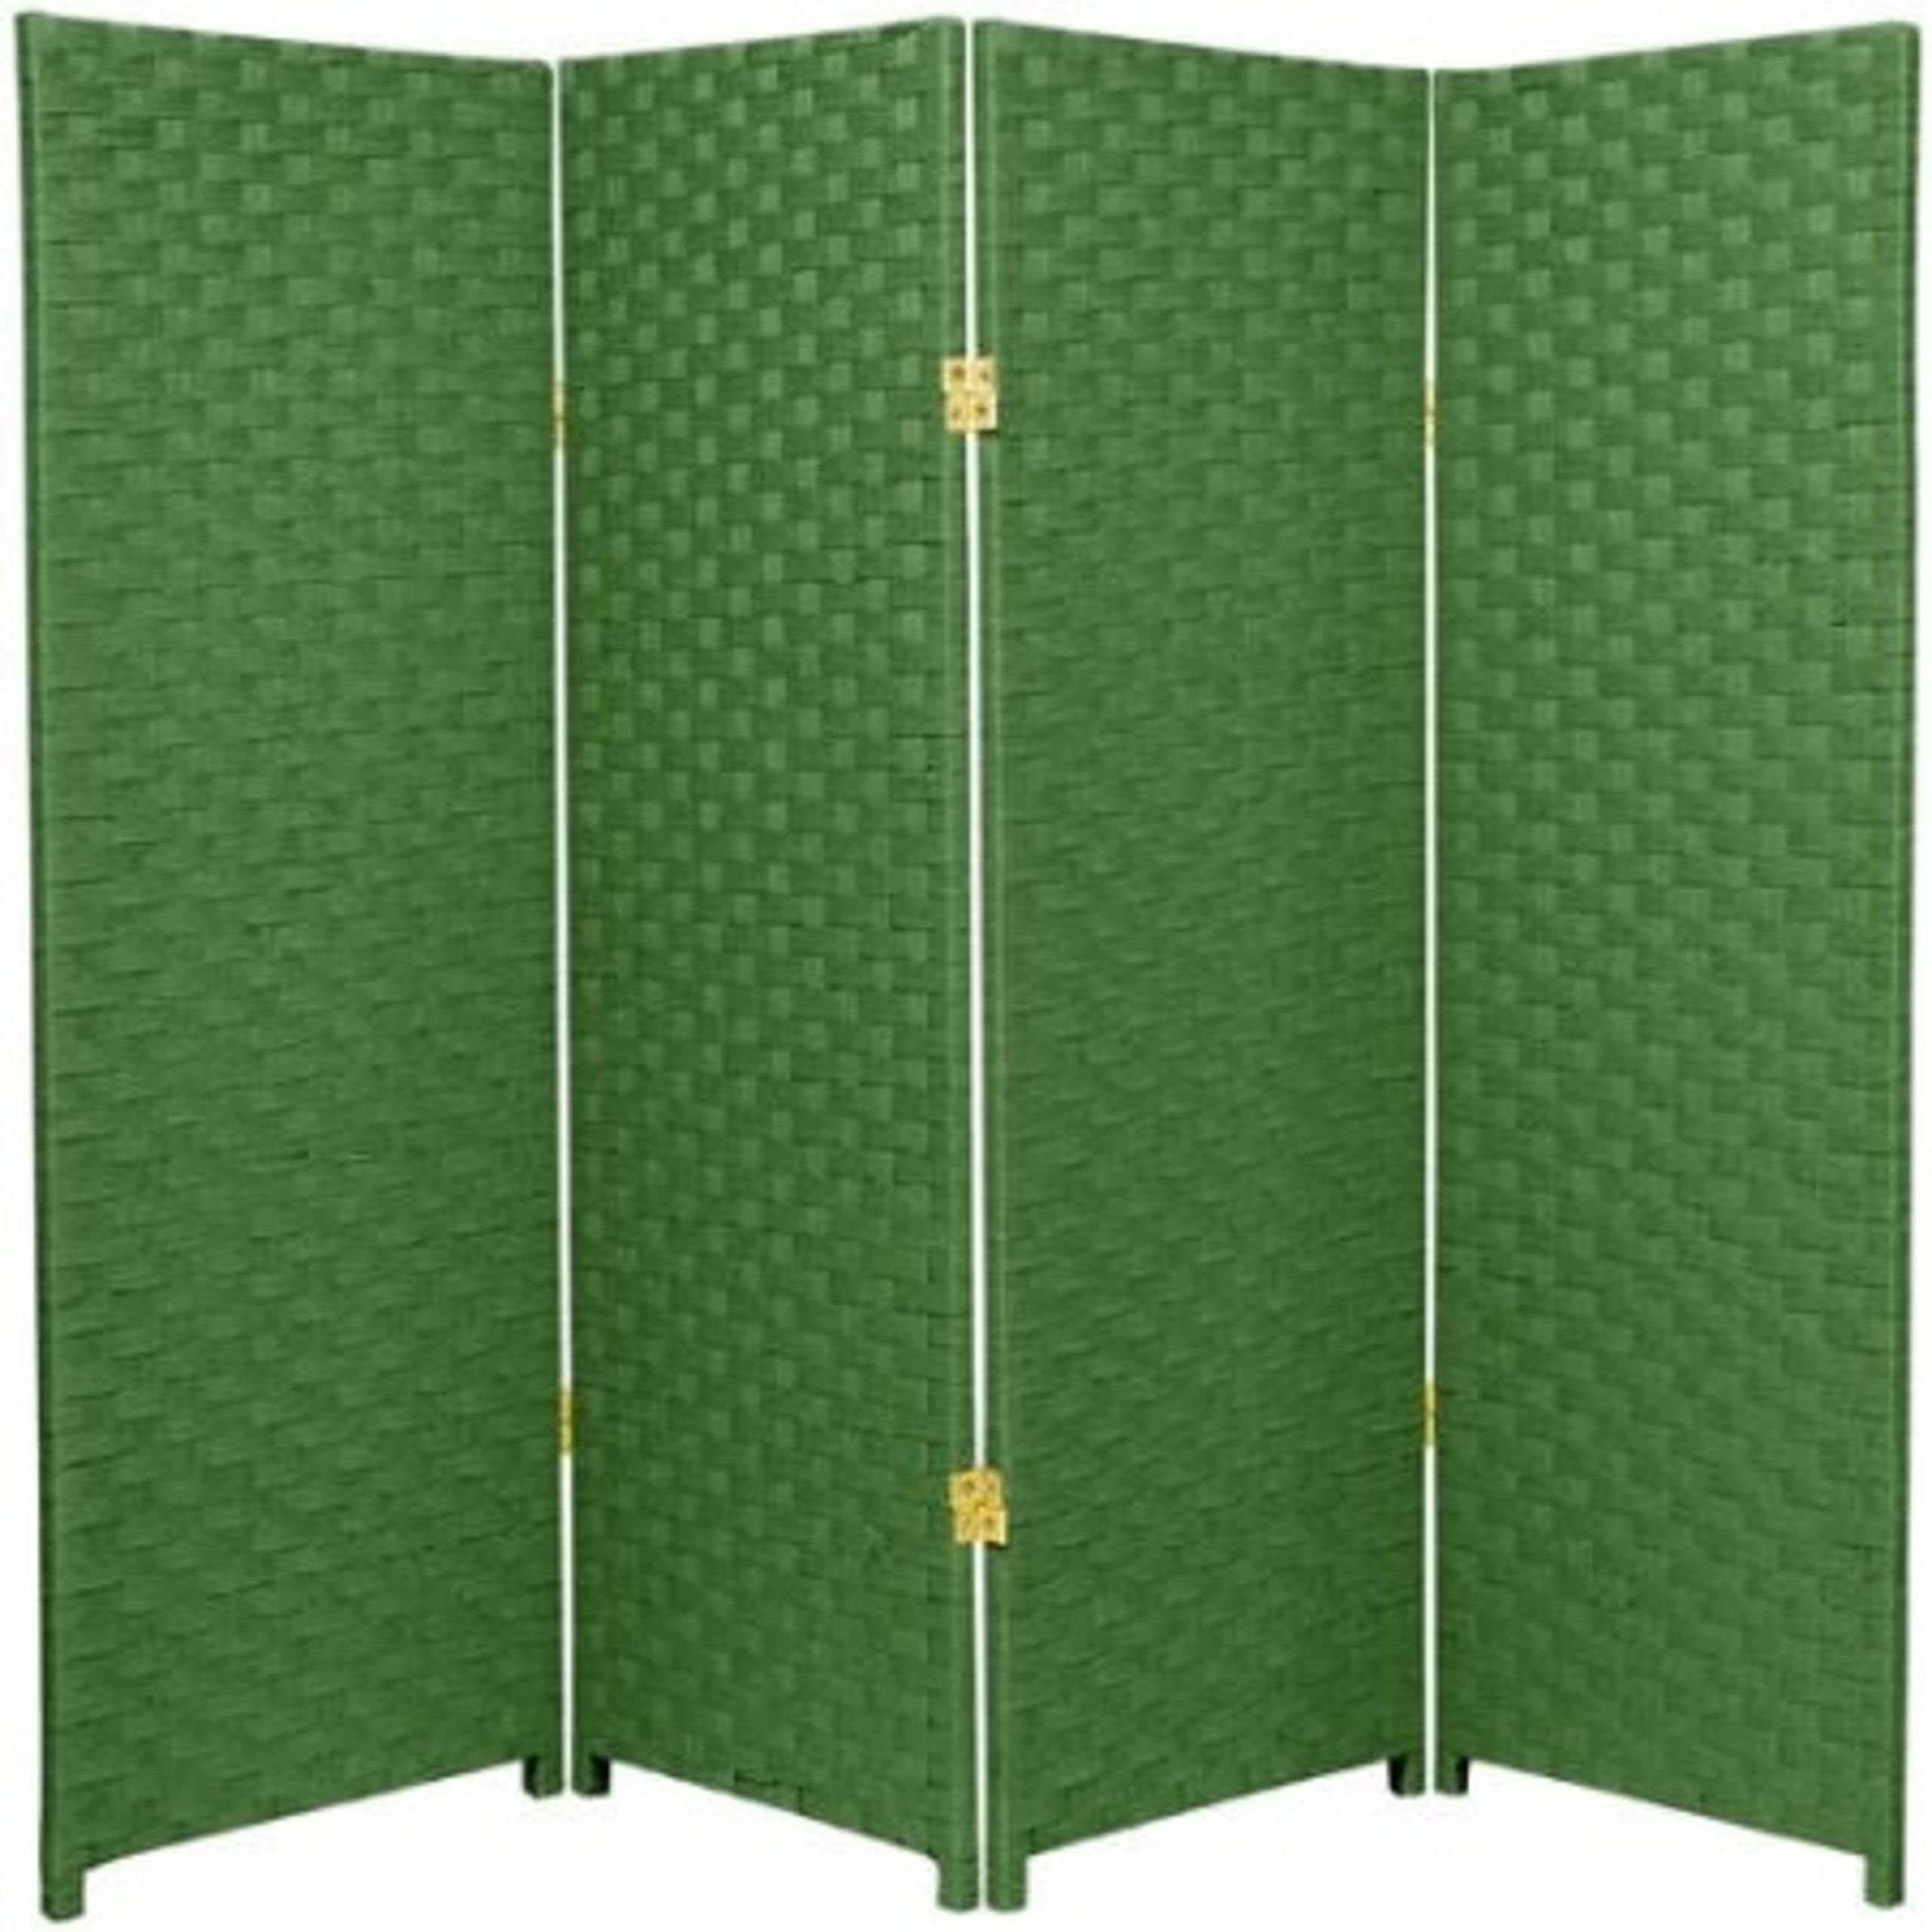 Natural Plant Fiber Woven Room Decor Light Green 4 Panels Divider